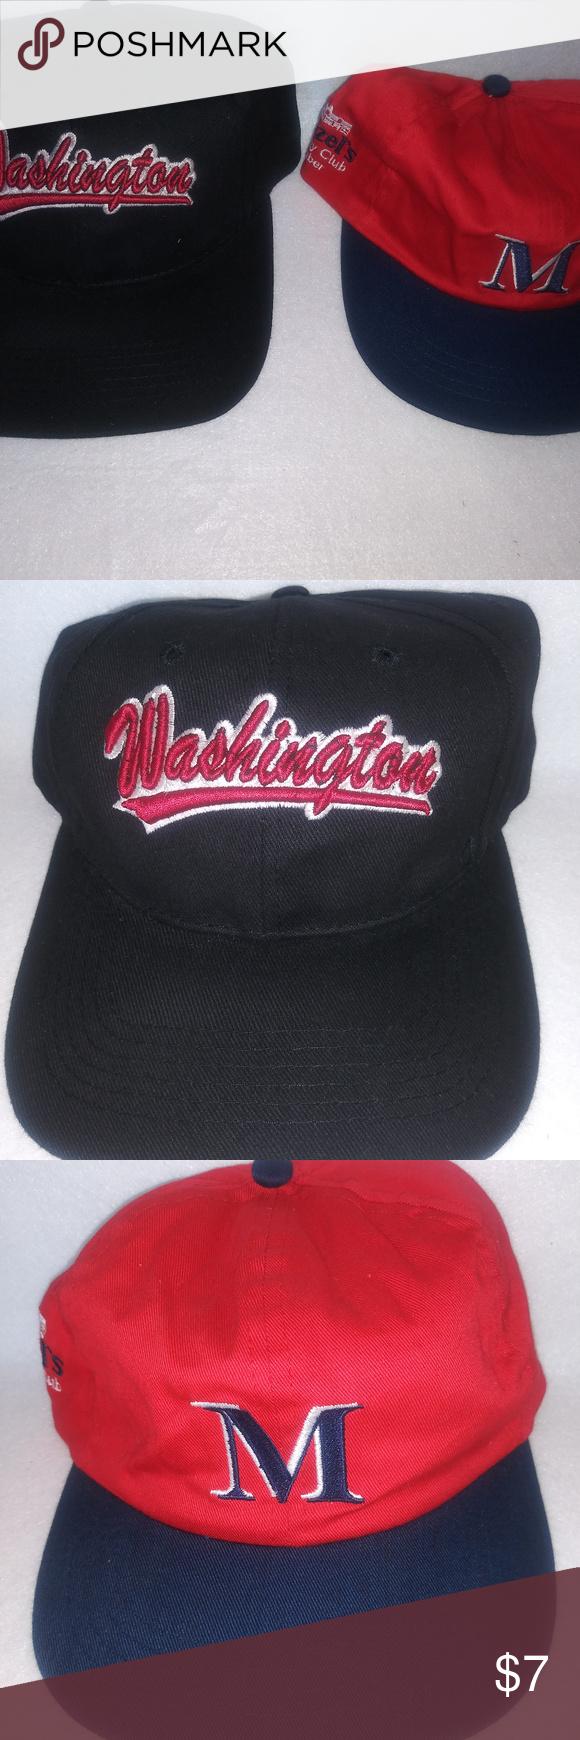 5e0ee1531f143 2 Lot Fashion Vintage Headwear Brand New 2 Lot Fashion Vintage Headwear  Both Hats Are Adjustable